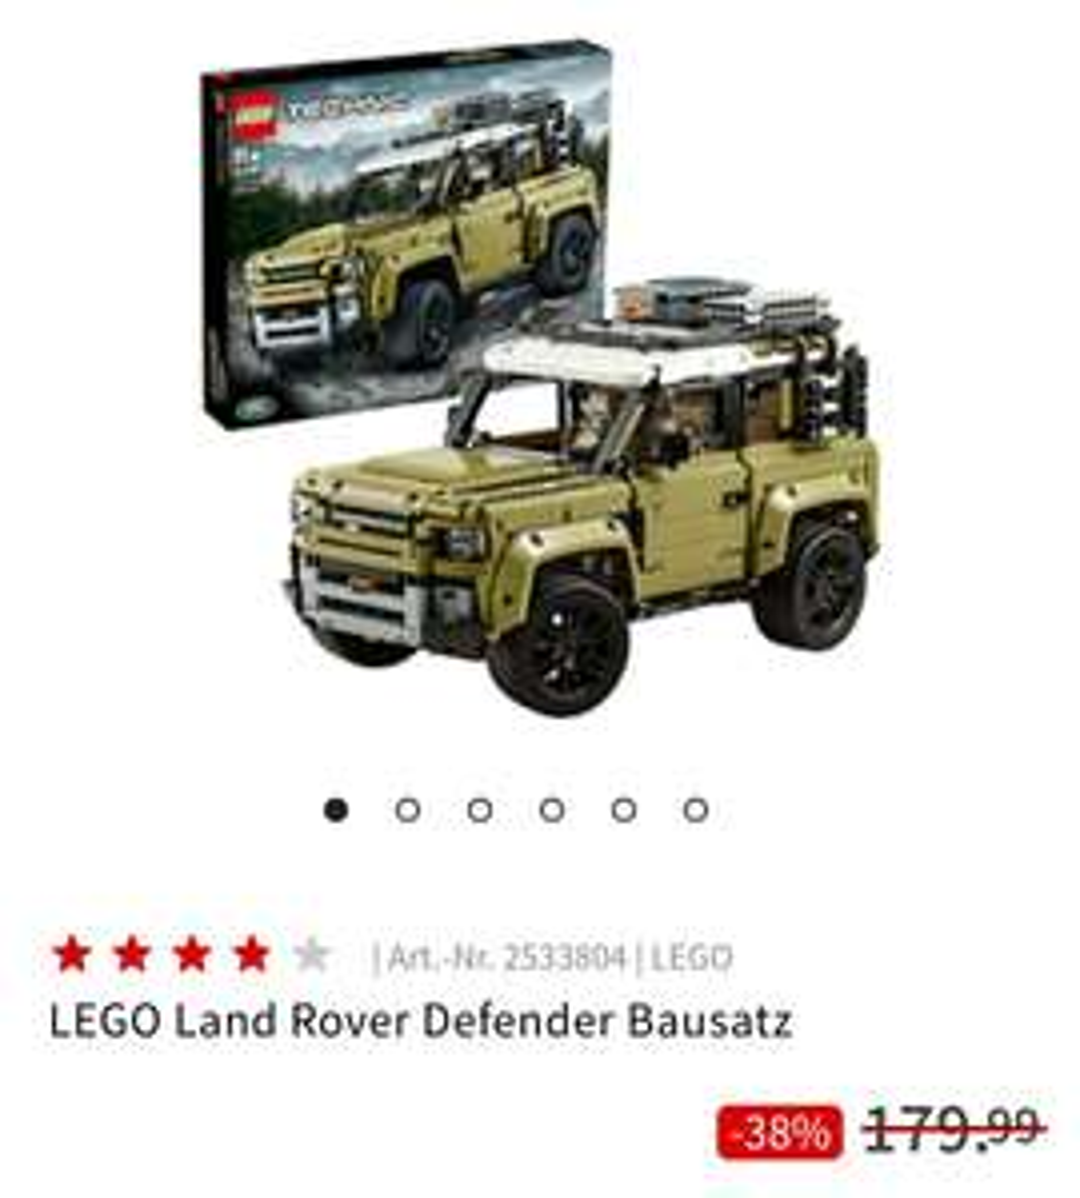 Lego Technic (42110) Land Rover Defender - MediaMarkt